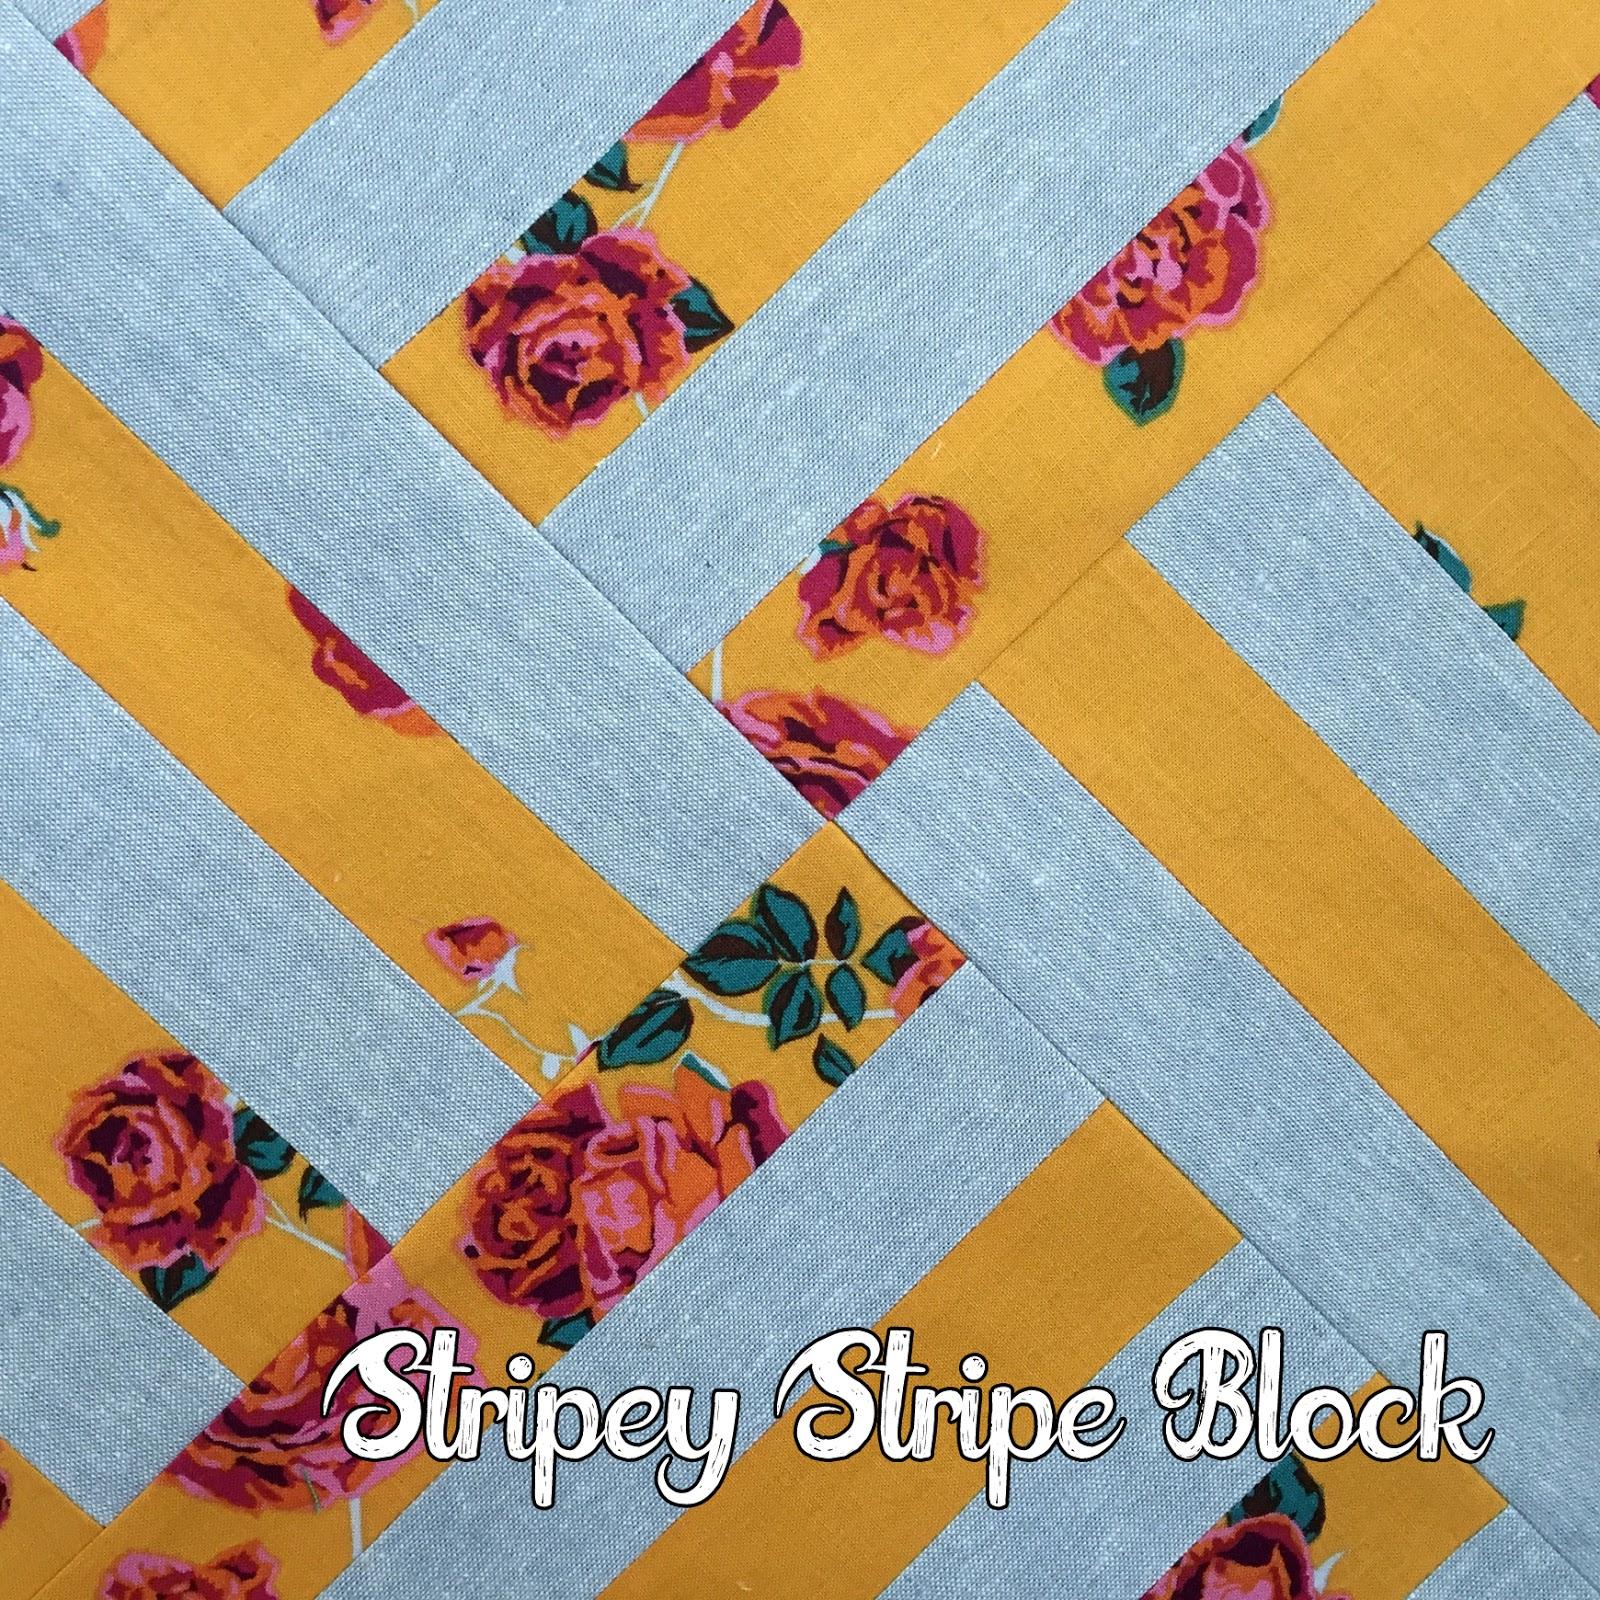 http://hotpinkquilts.blogspot.com/2017/04/stripey-stripe-block-tutorial.html